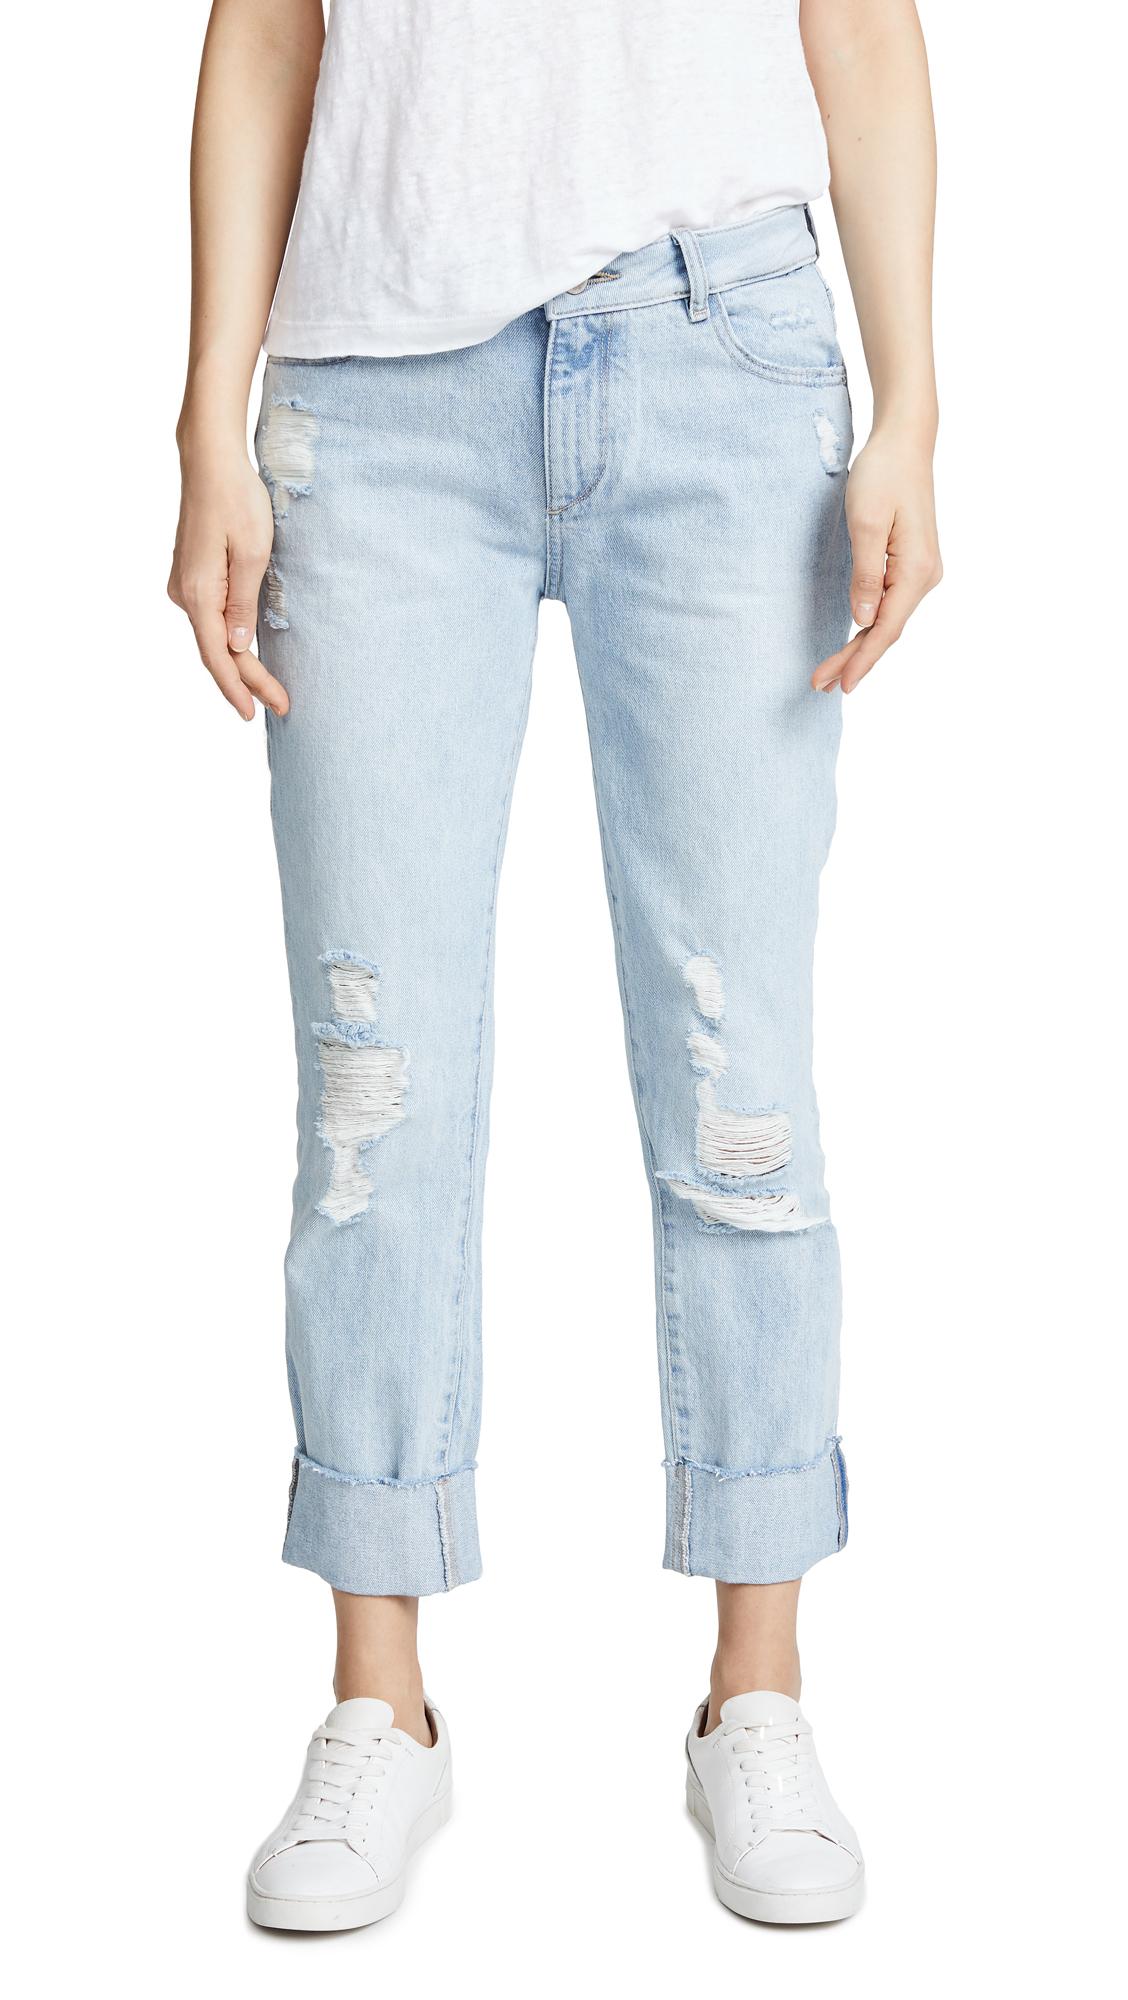 DL1961 Stevie Rigid Slim Boyfriend Jeans